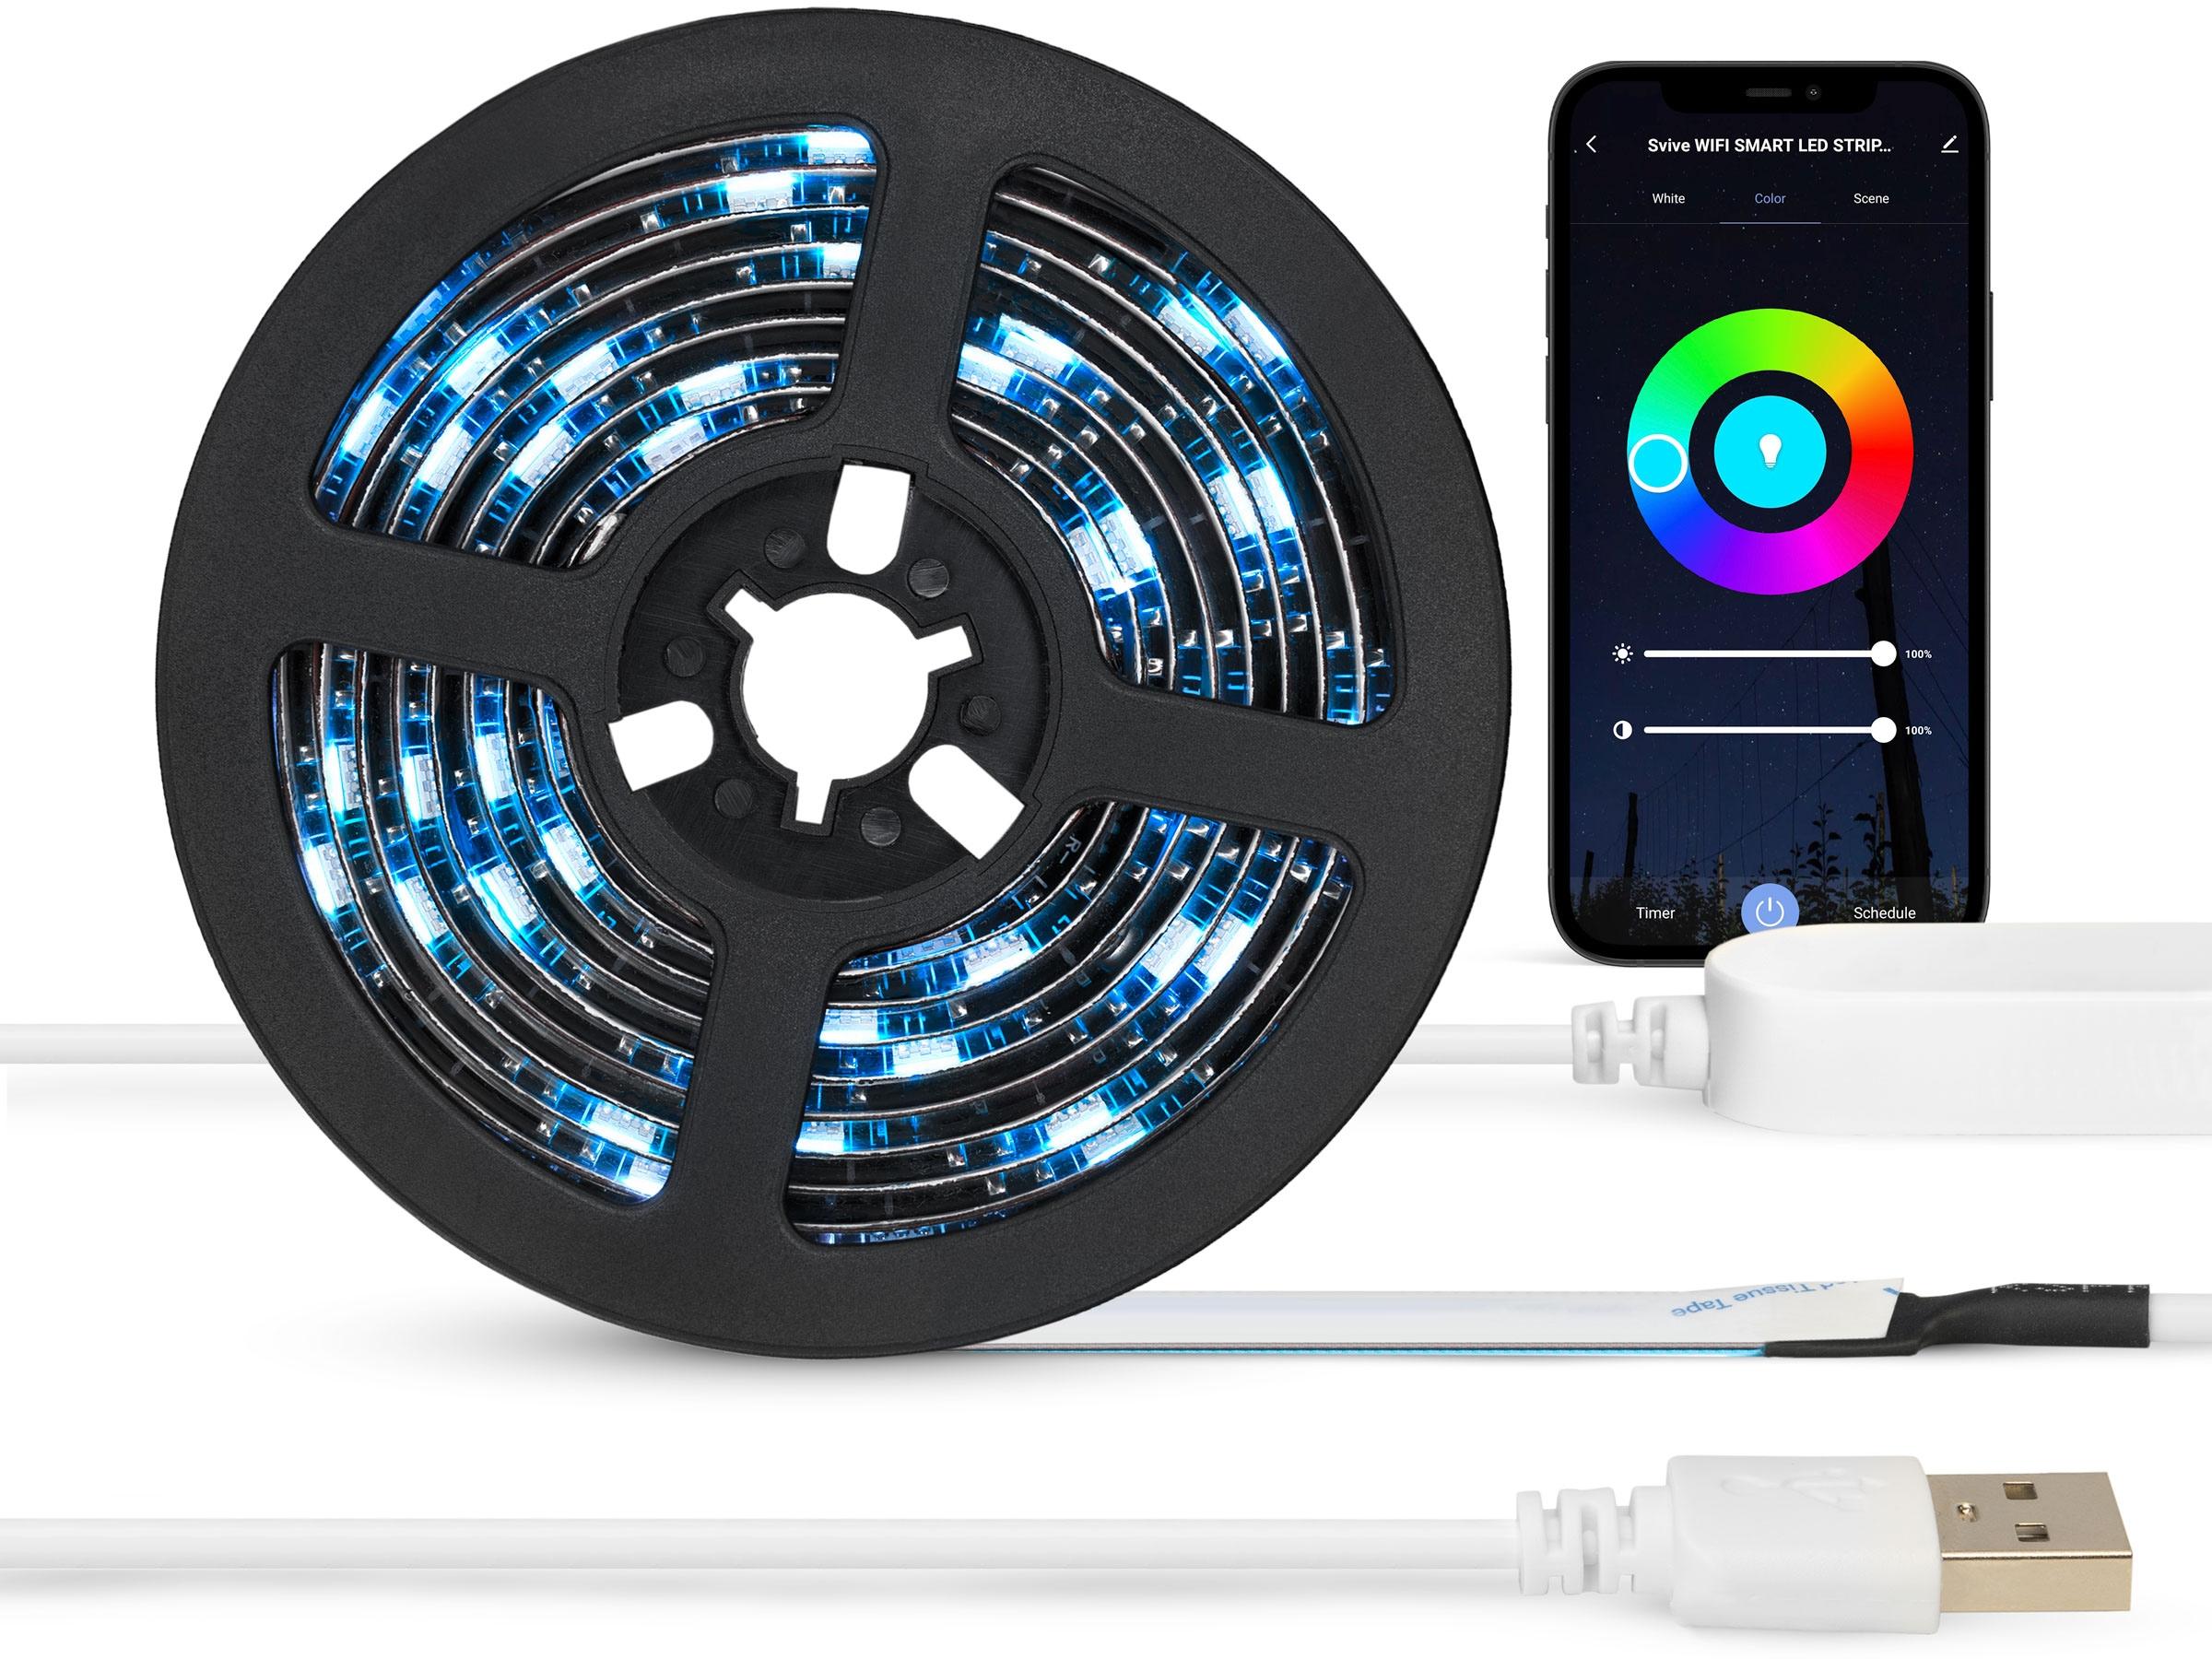 Svive Aurora WiFi Smart LED Strip 2M